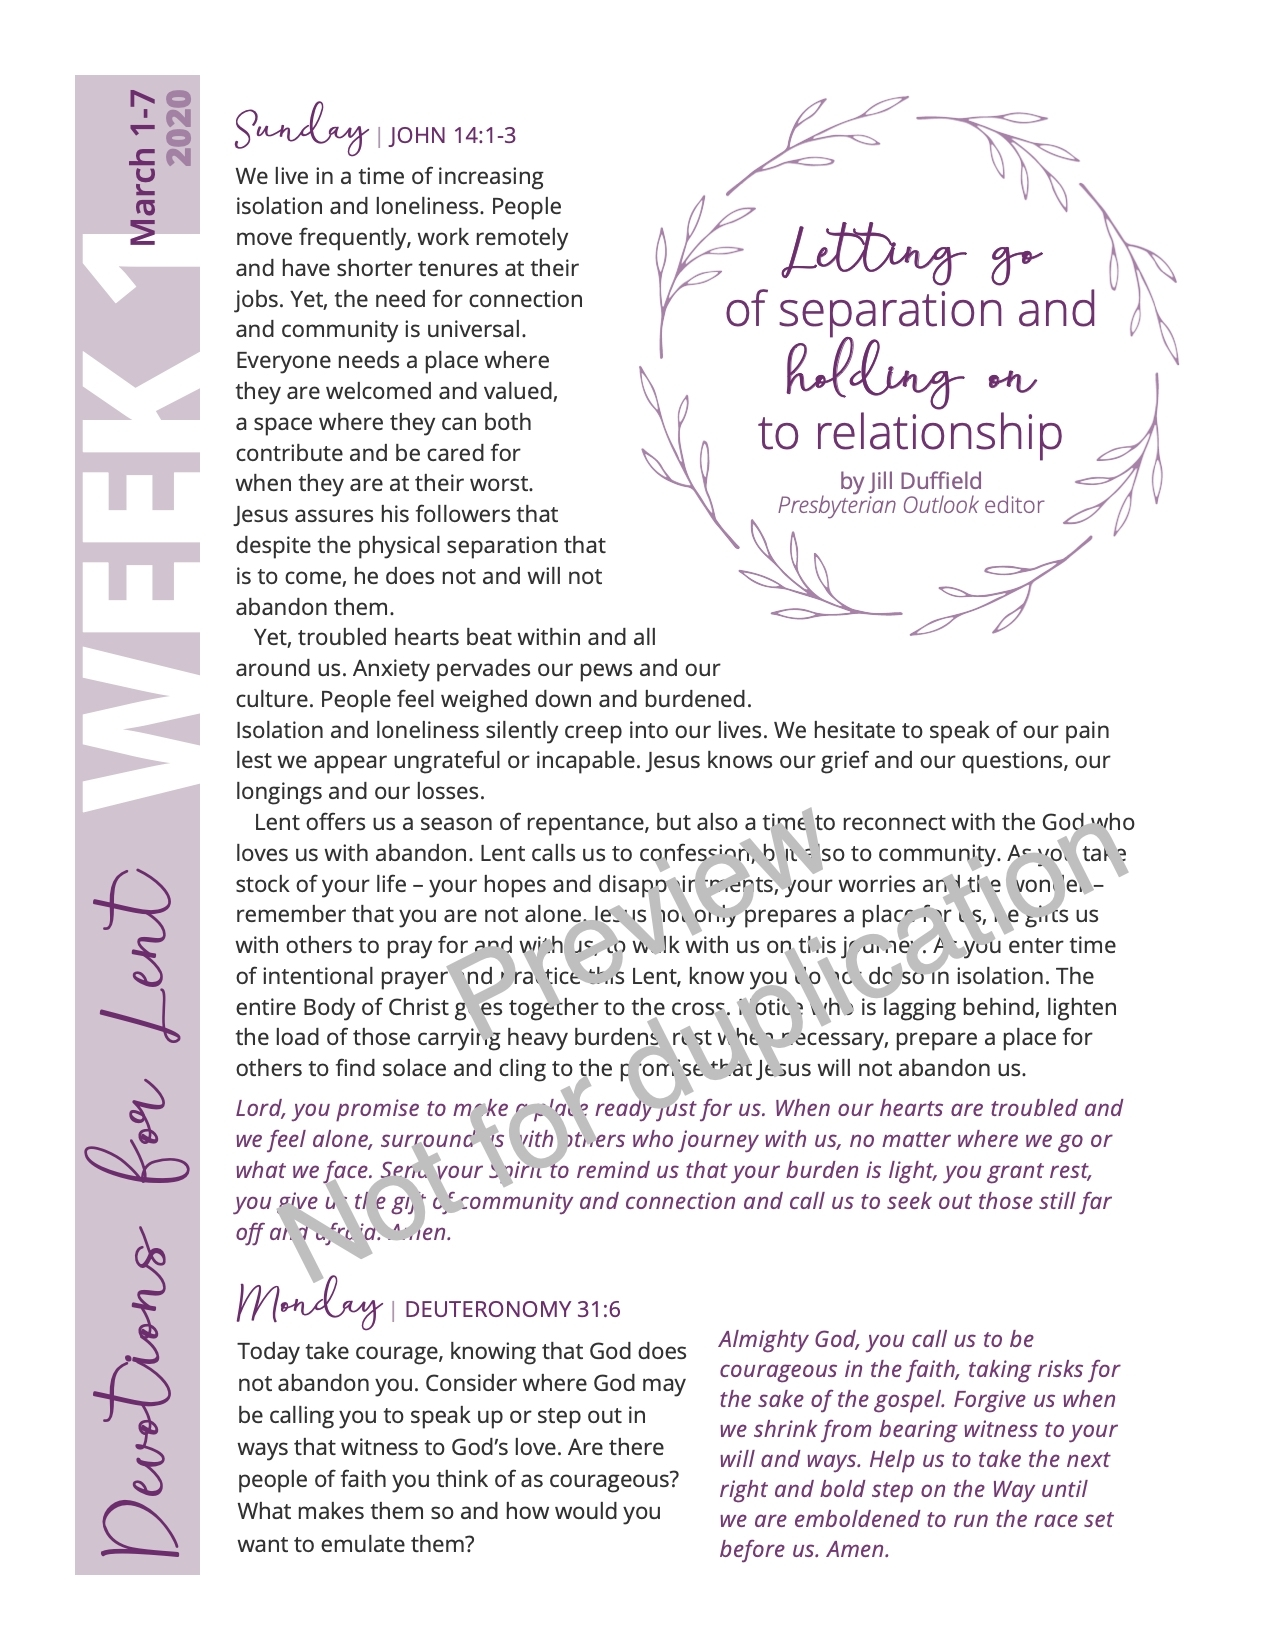 Lenten Devotions — Year A (2020) - The Presbyterian Outlook intended for Printable Presbyterian 2020 Liturgical Color Calendar